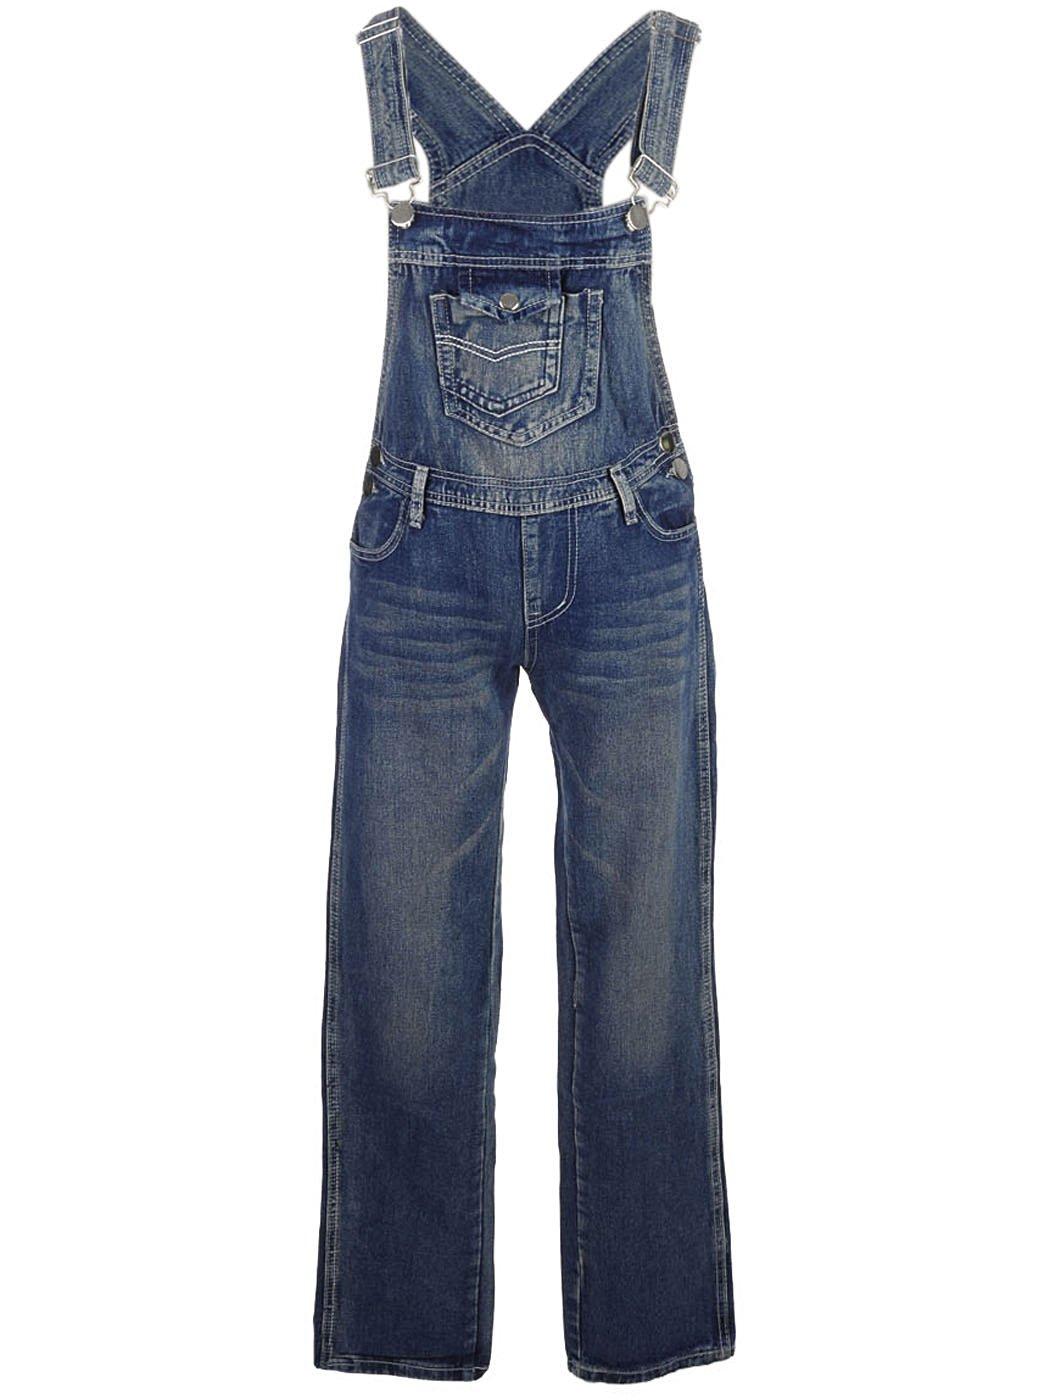 Anna-Kaci Womens Vintage Wash Straight Leg Denim Overalls with Pocket Bib, Blue, Medium/Large by Anna-Kaci